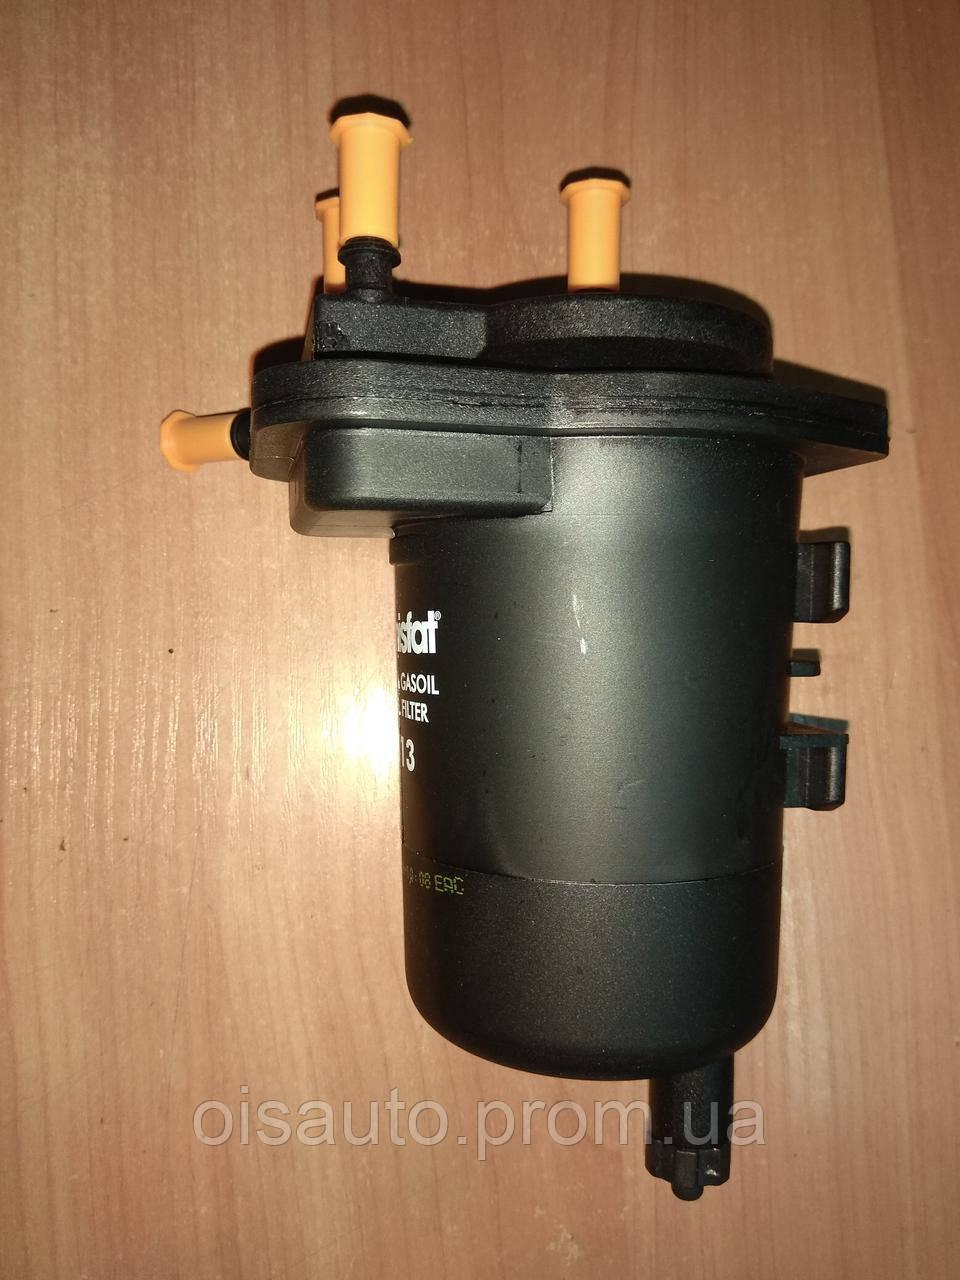 Фільтр палива MISFAT F113 (1.5dci) kango/clio/micra